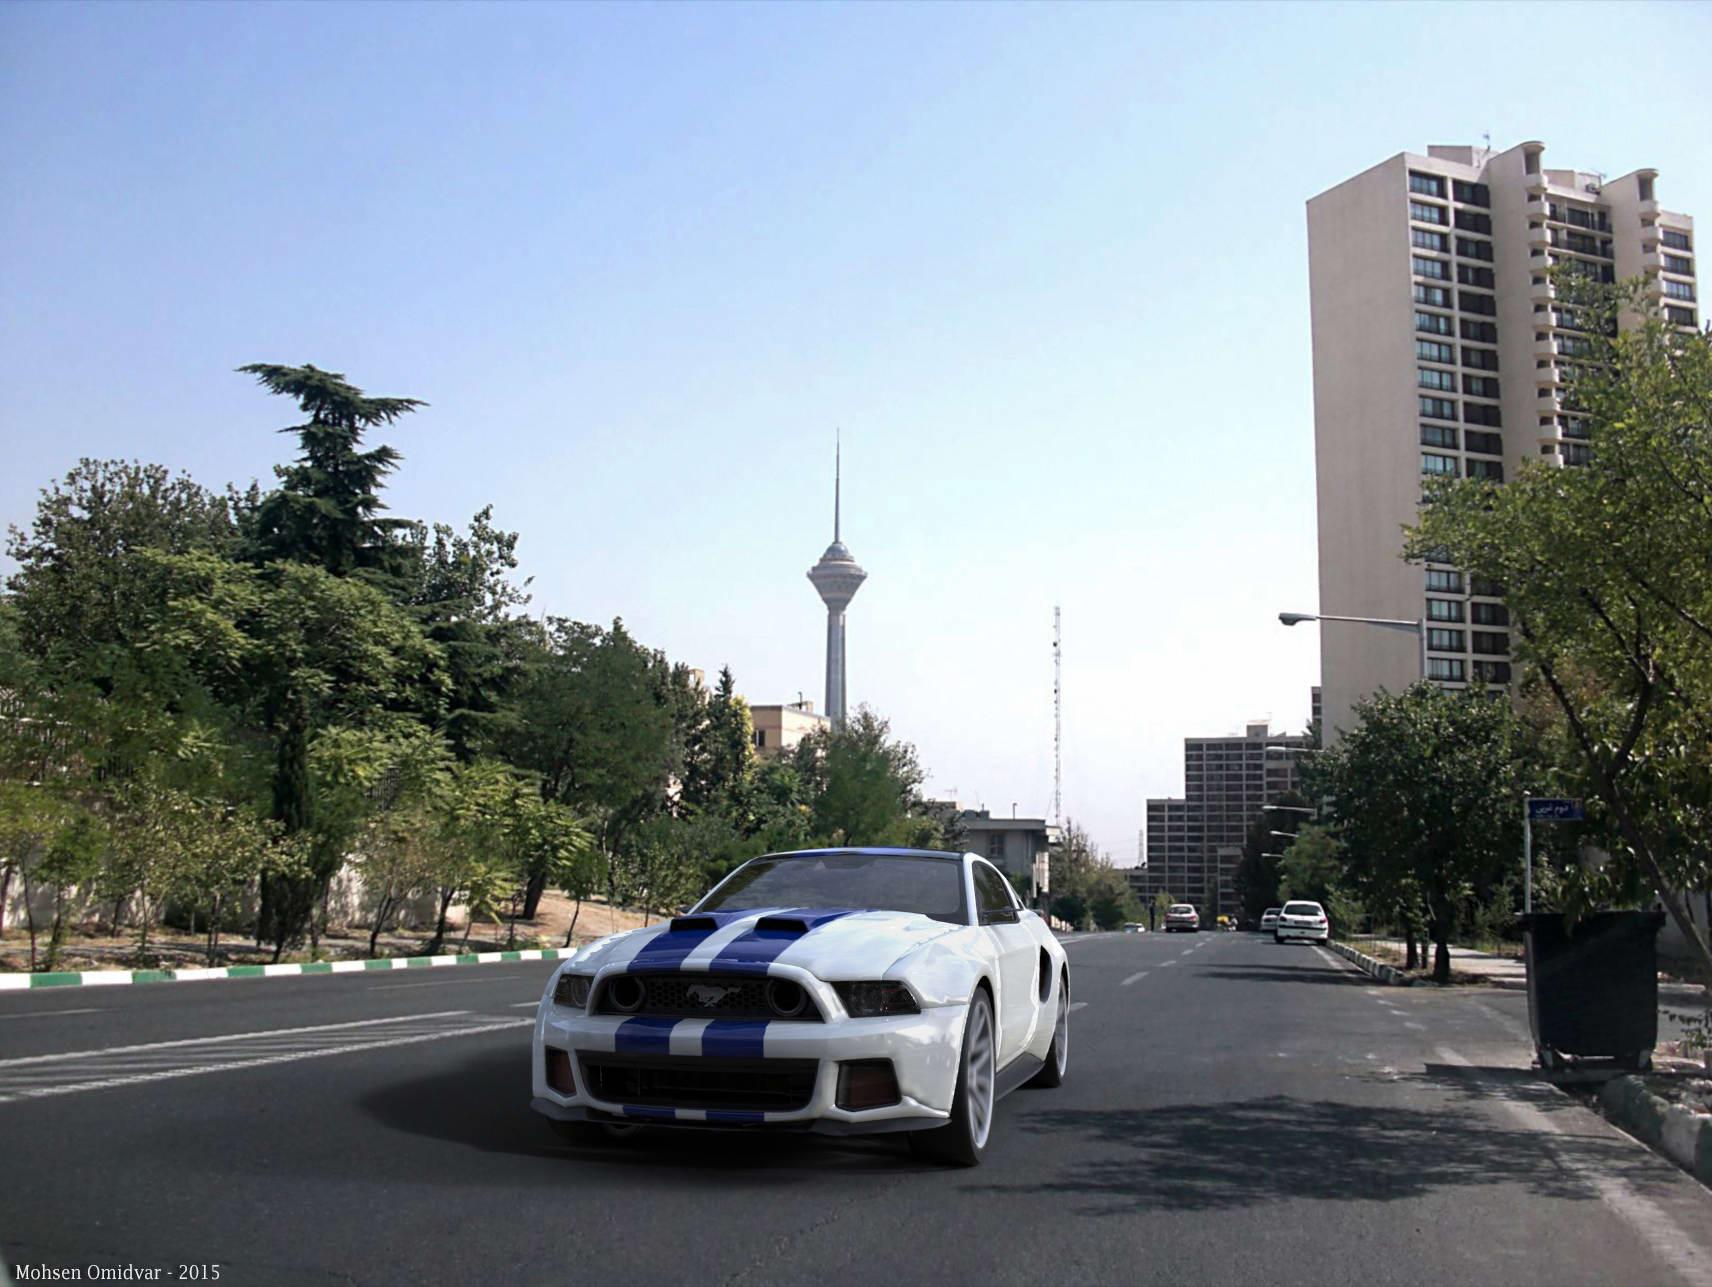 Mustang_GT - Mohsen Omidvar - آموزش تطبیق مدل با محیط و پس زمینه در تریدی اس مکس